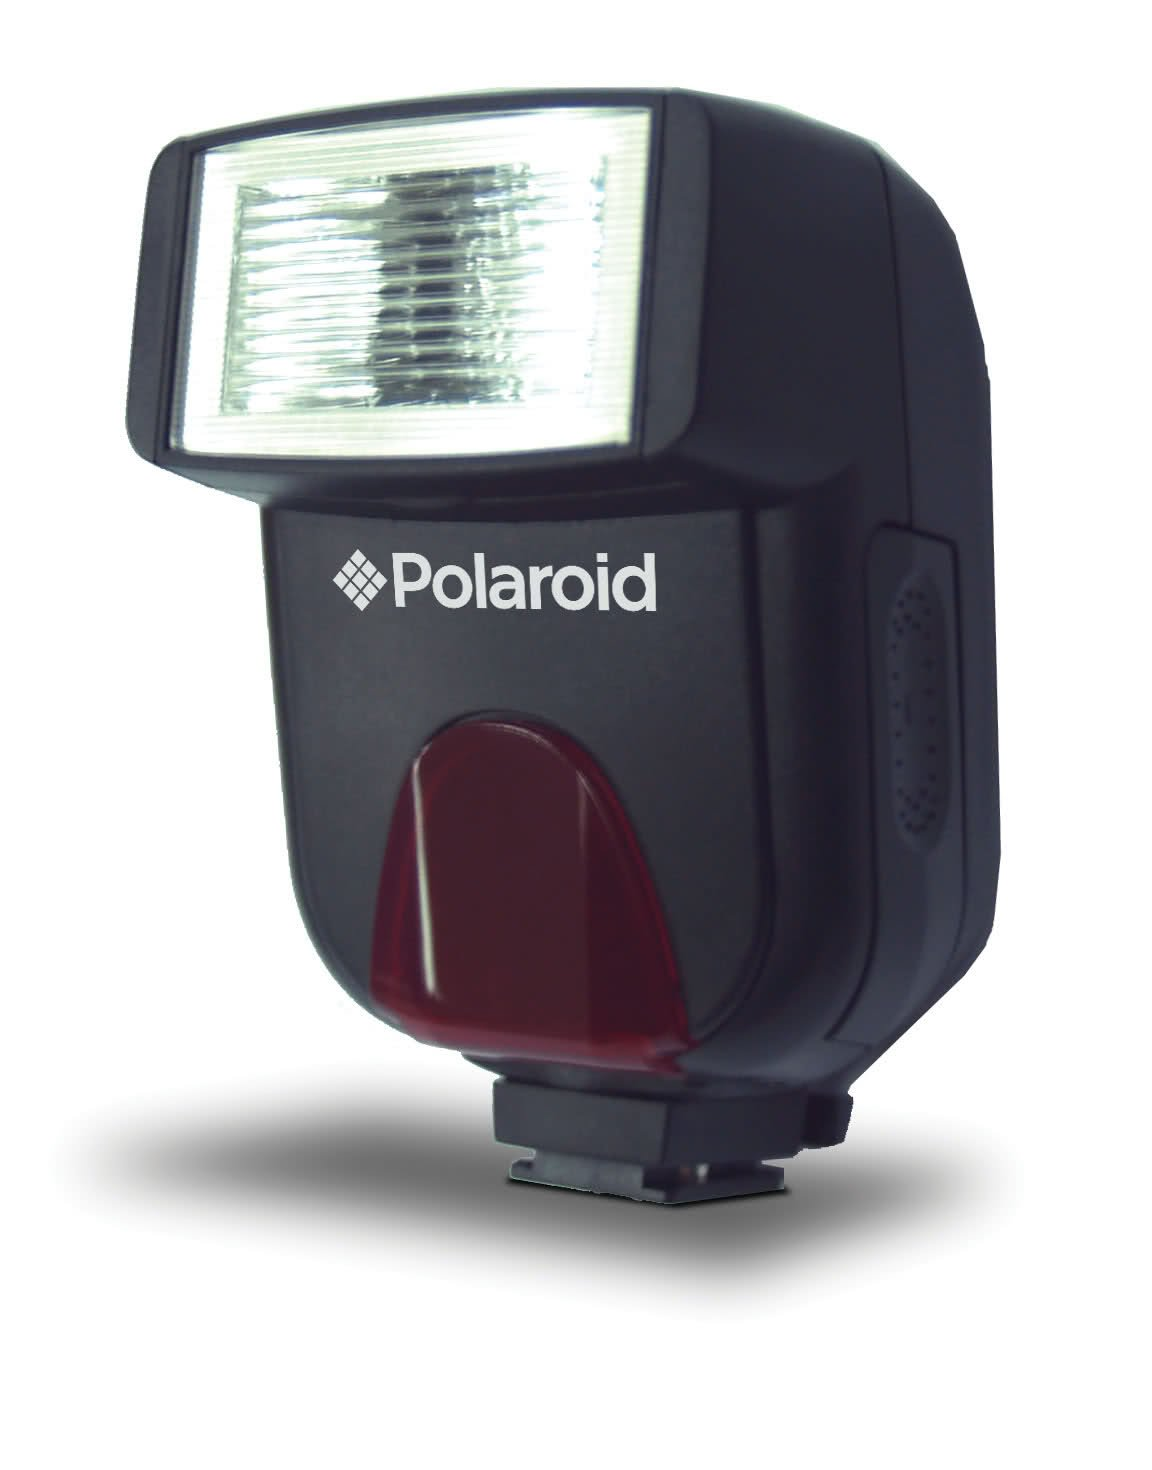 Polaroid PL-108AF Studio Series Digital Auto Focus / TTL Shoe Mount Flash For Select Sony NEX Series Digital Cameras by Polaroid